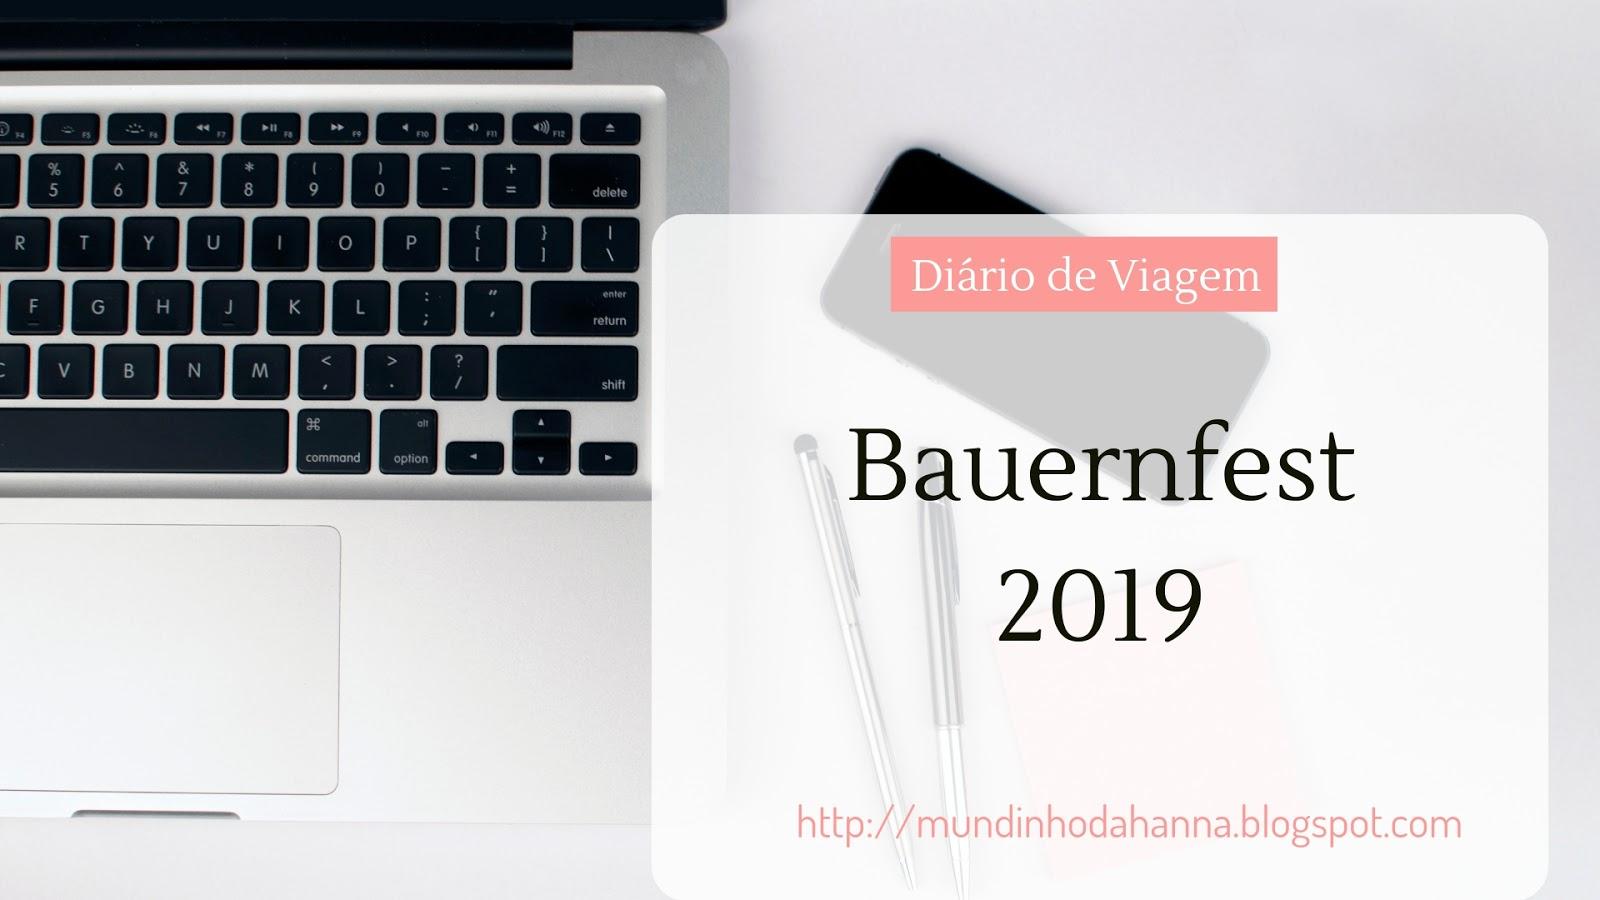 Bauernfest 2019